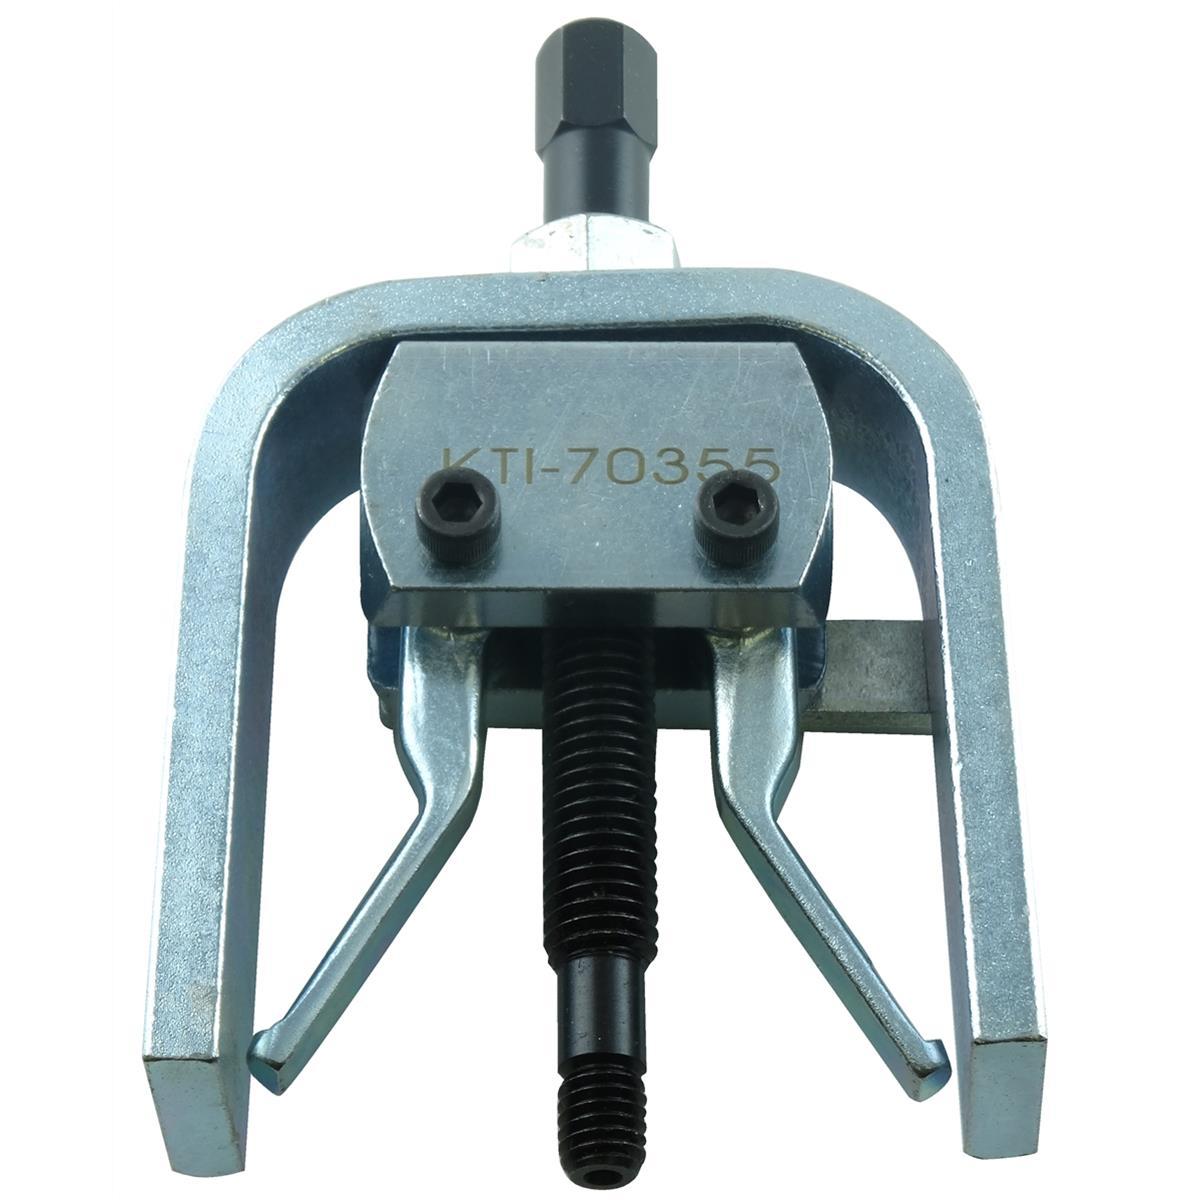 Hydraulic Pilot Bearing Puller : K tool pilot bearing puller